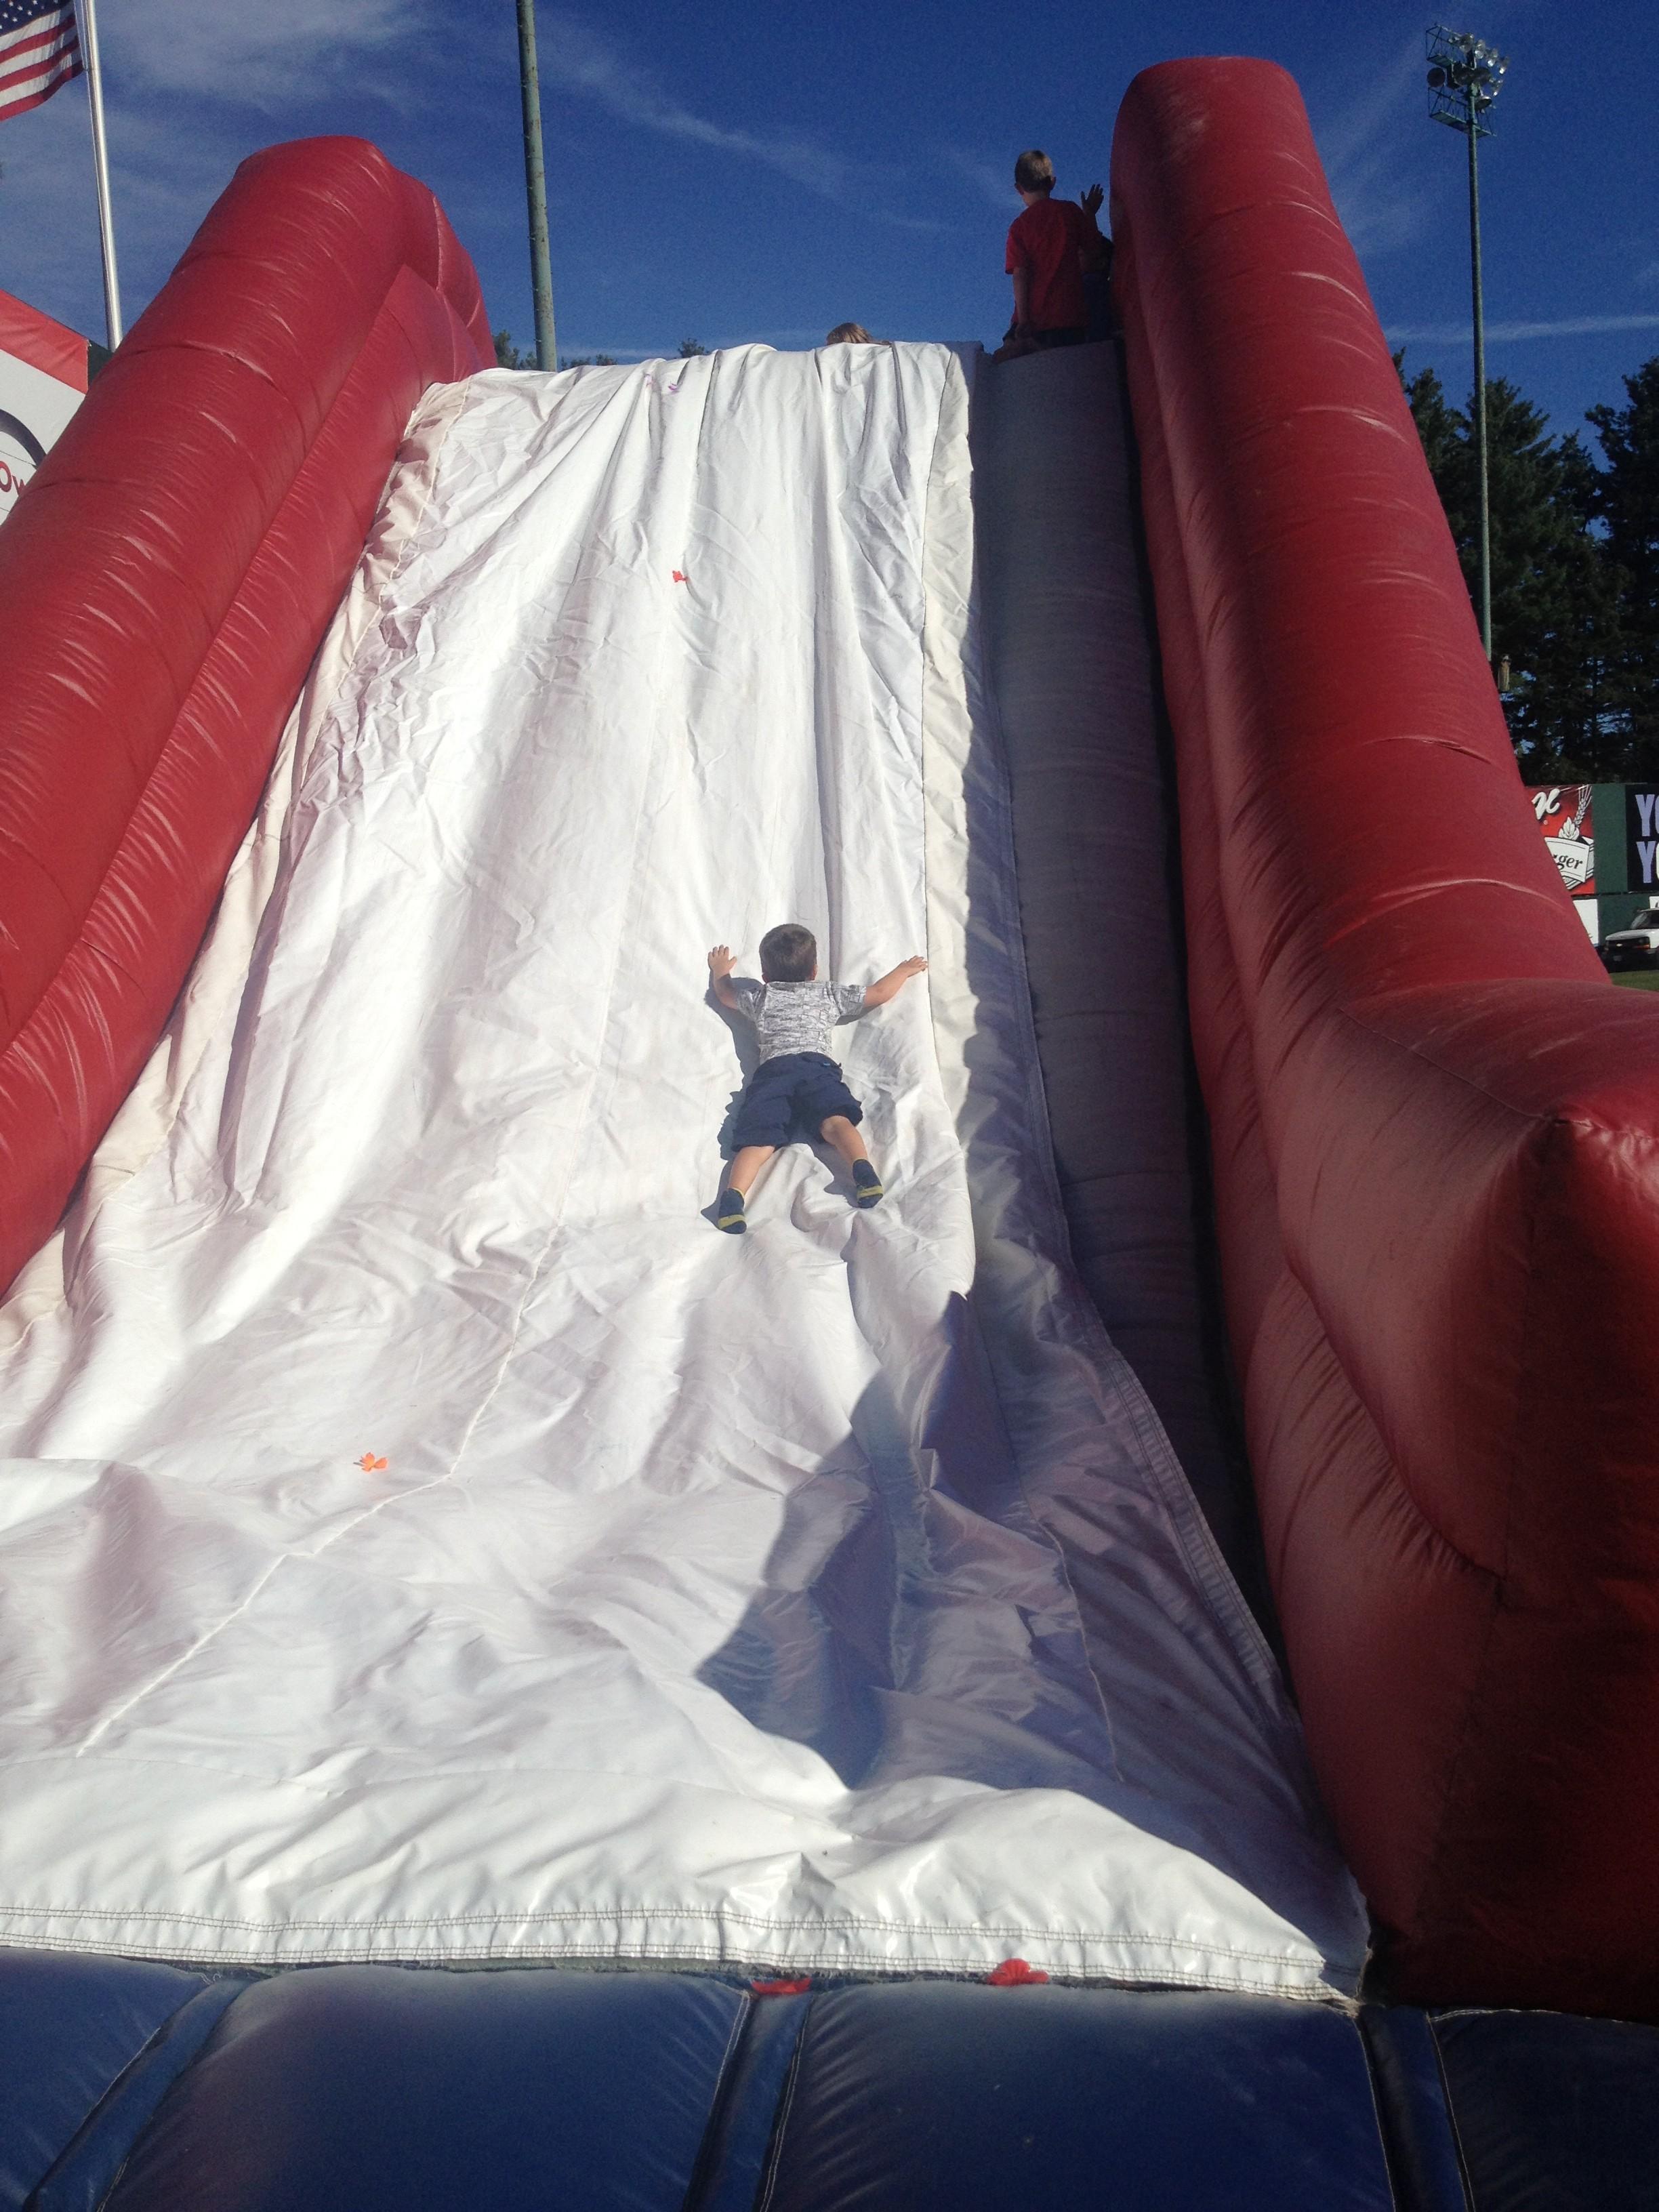 Patrick, taking full advantage of the bouncy-house slide.